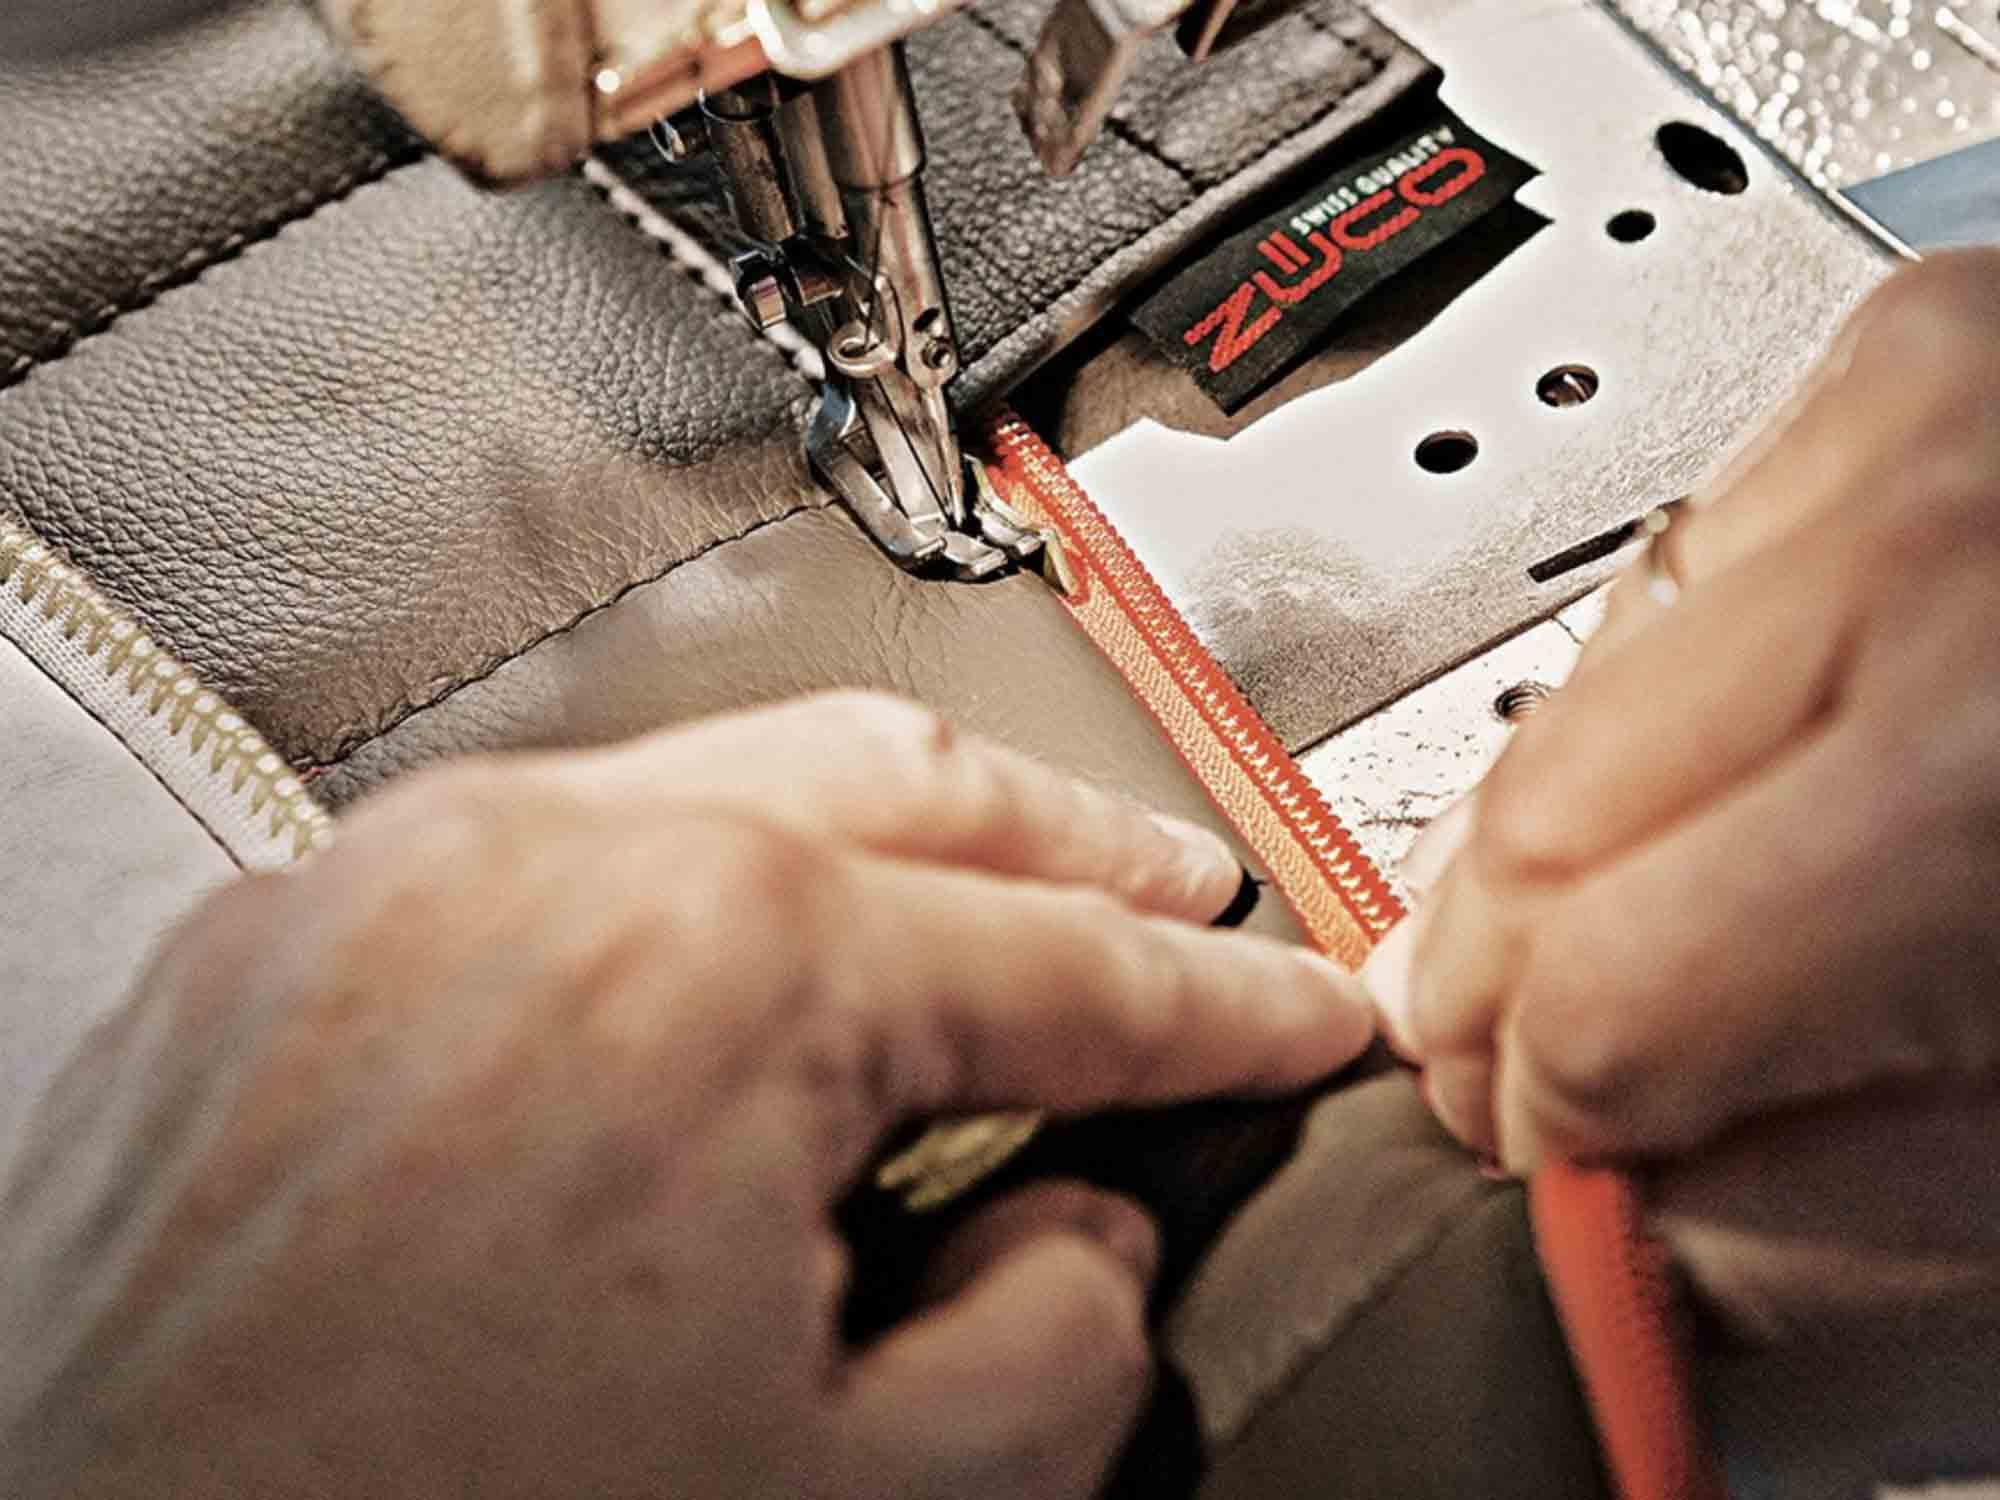 Zueco_Manufaktur_Produktion_Handarbeit